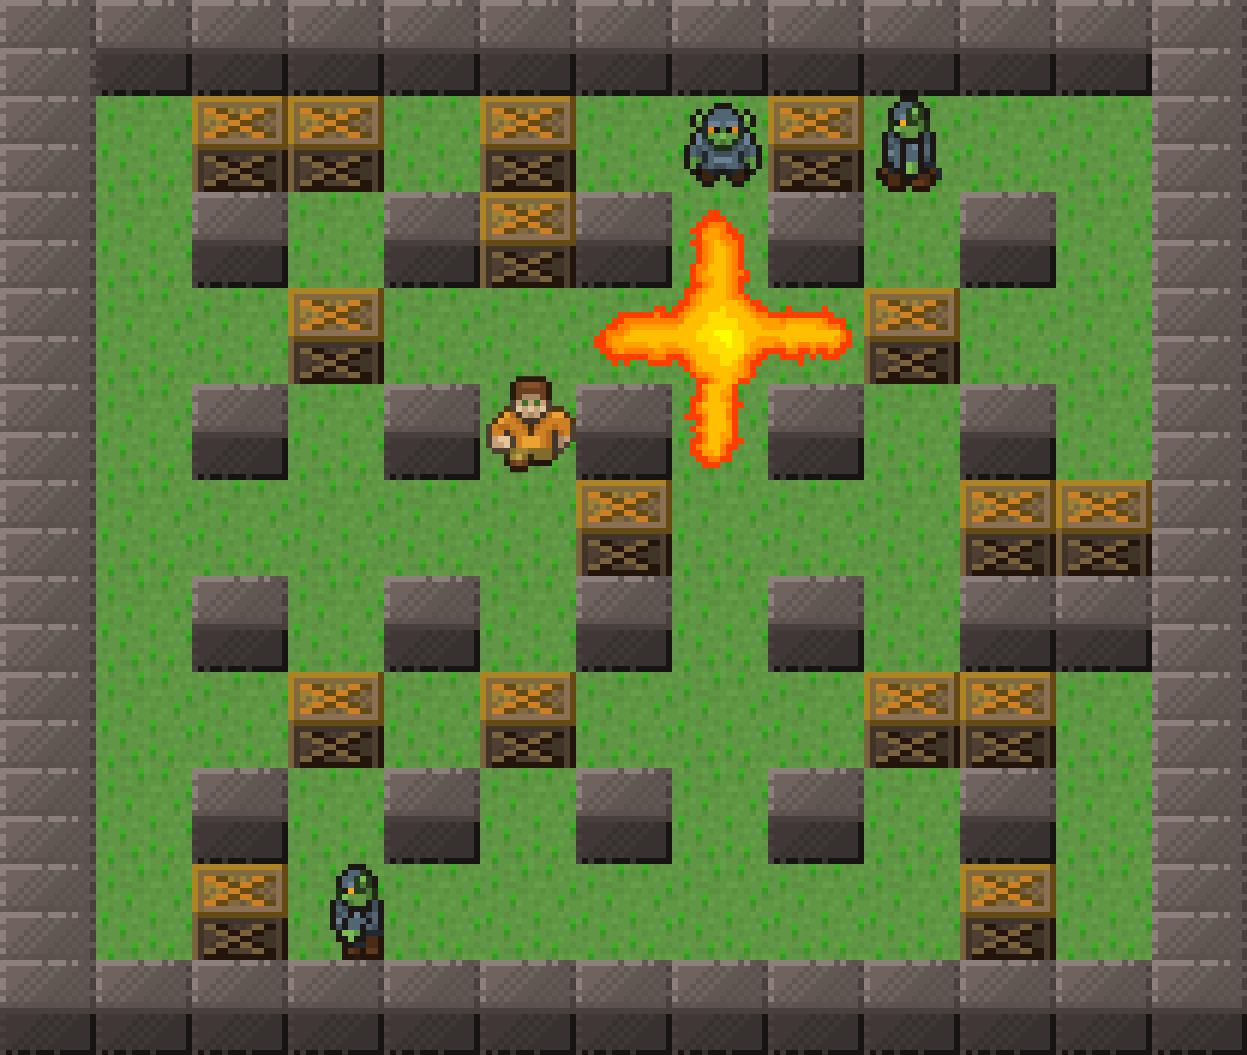 gameplay screenshot wthh an explosion